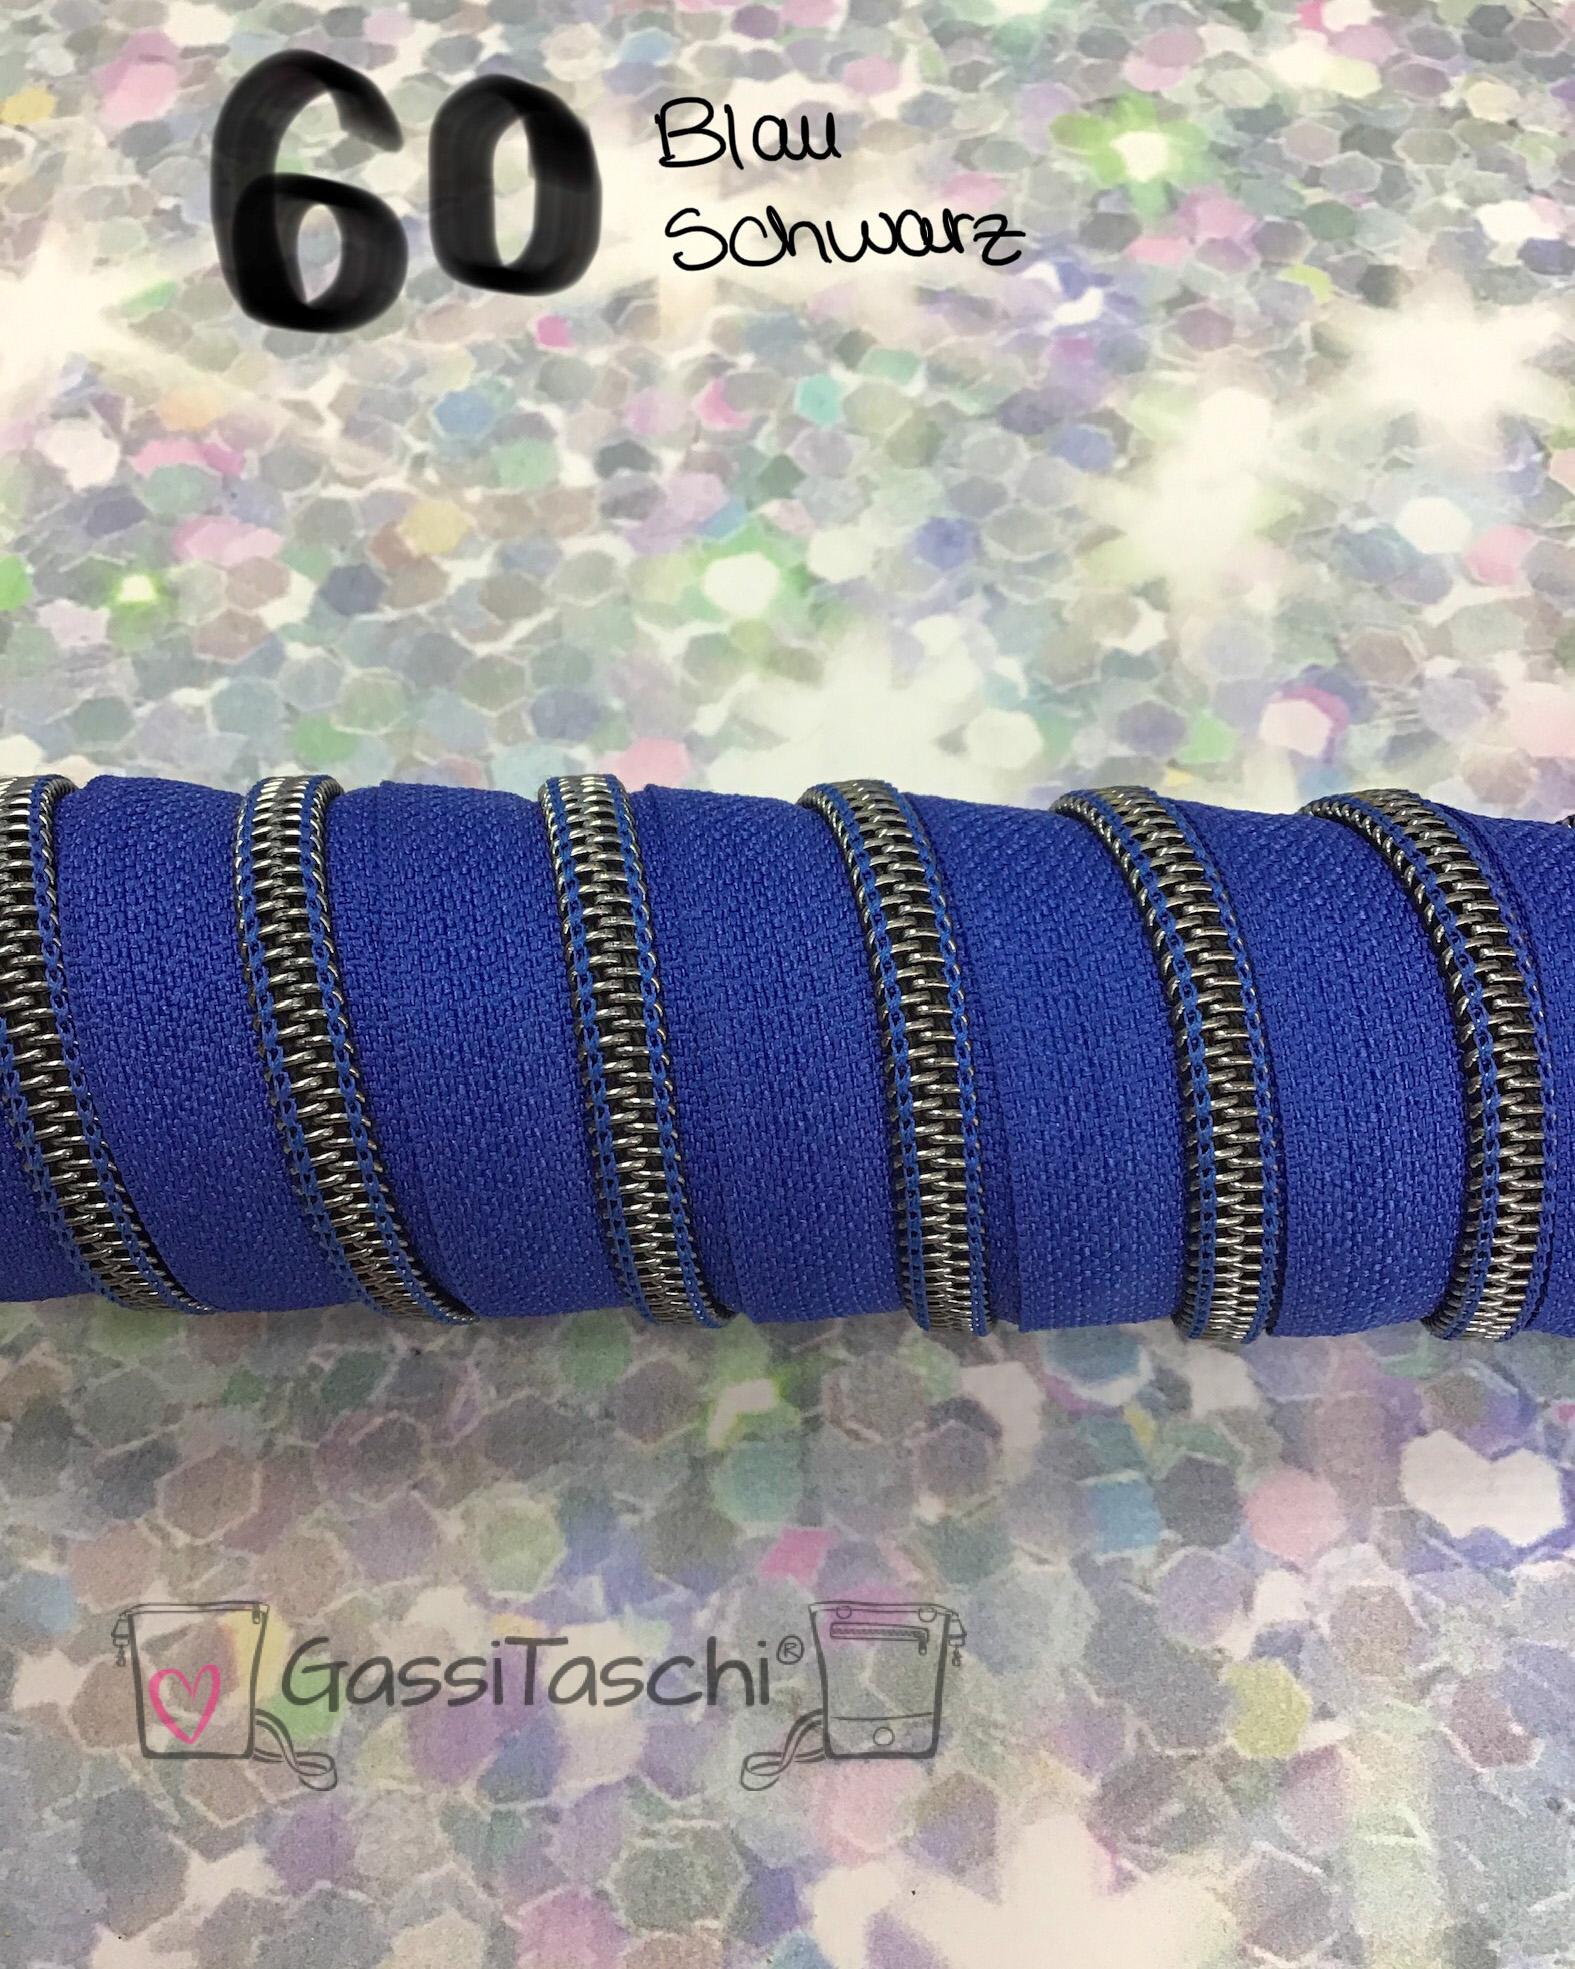 060-blau-schwarz